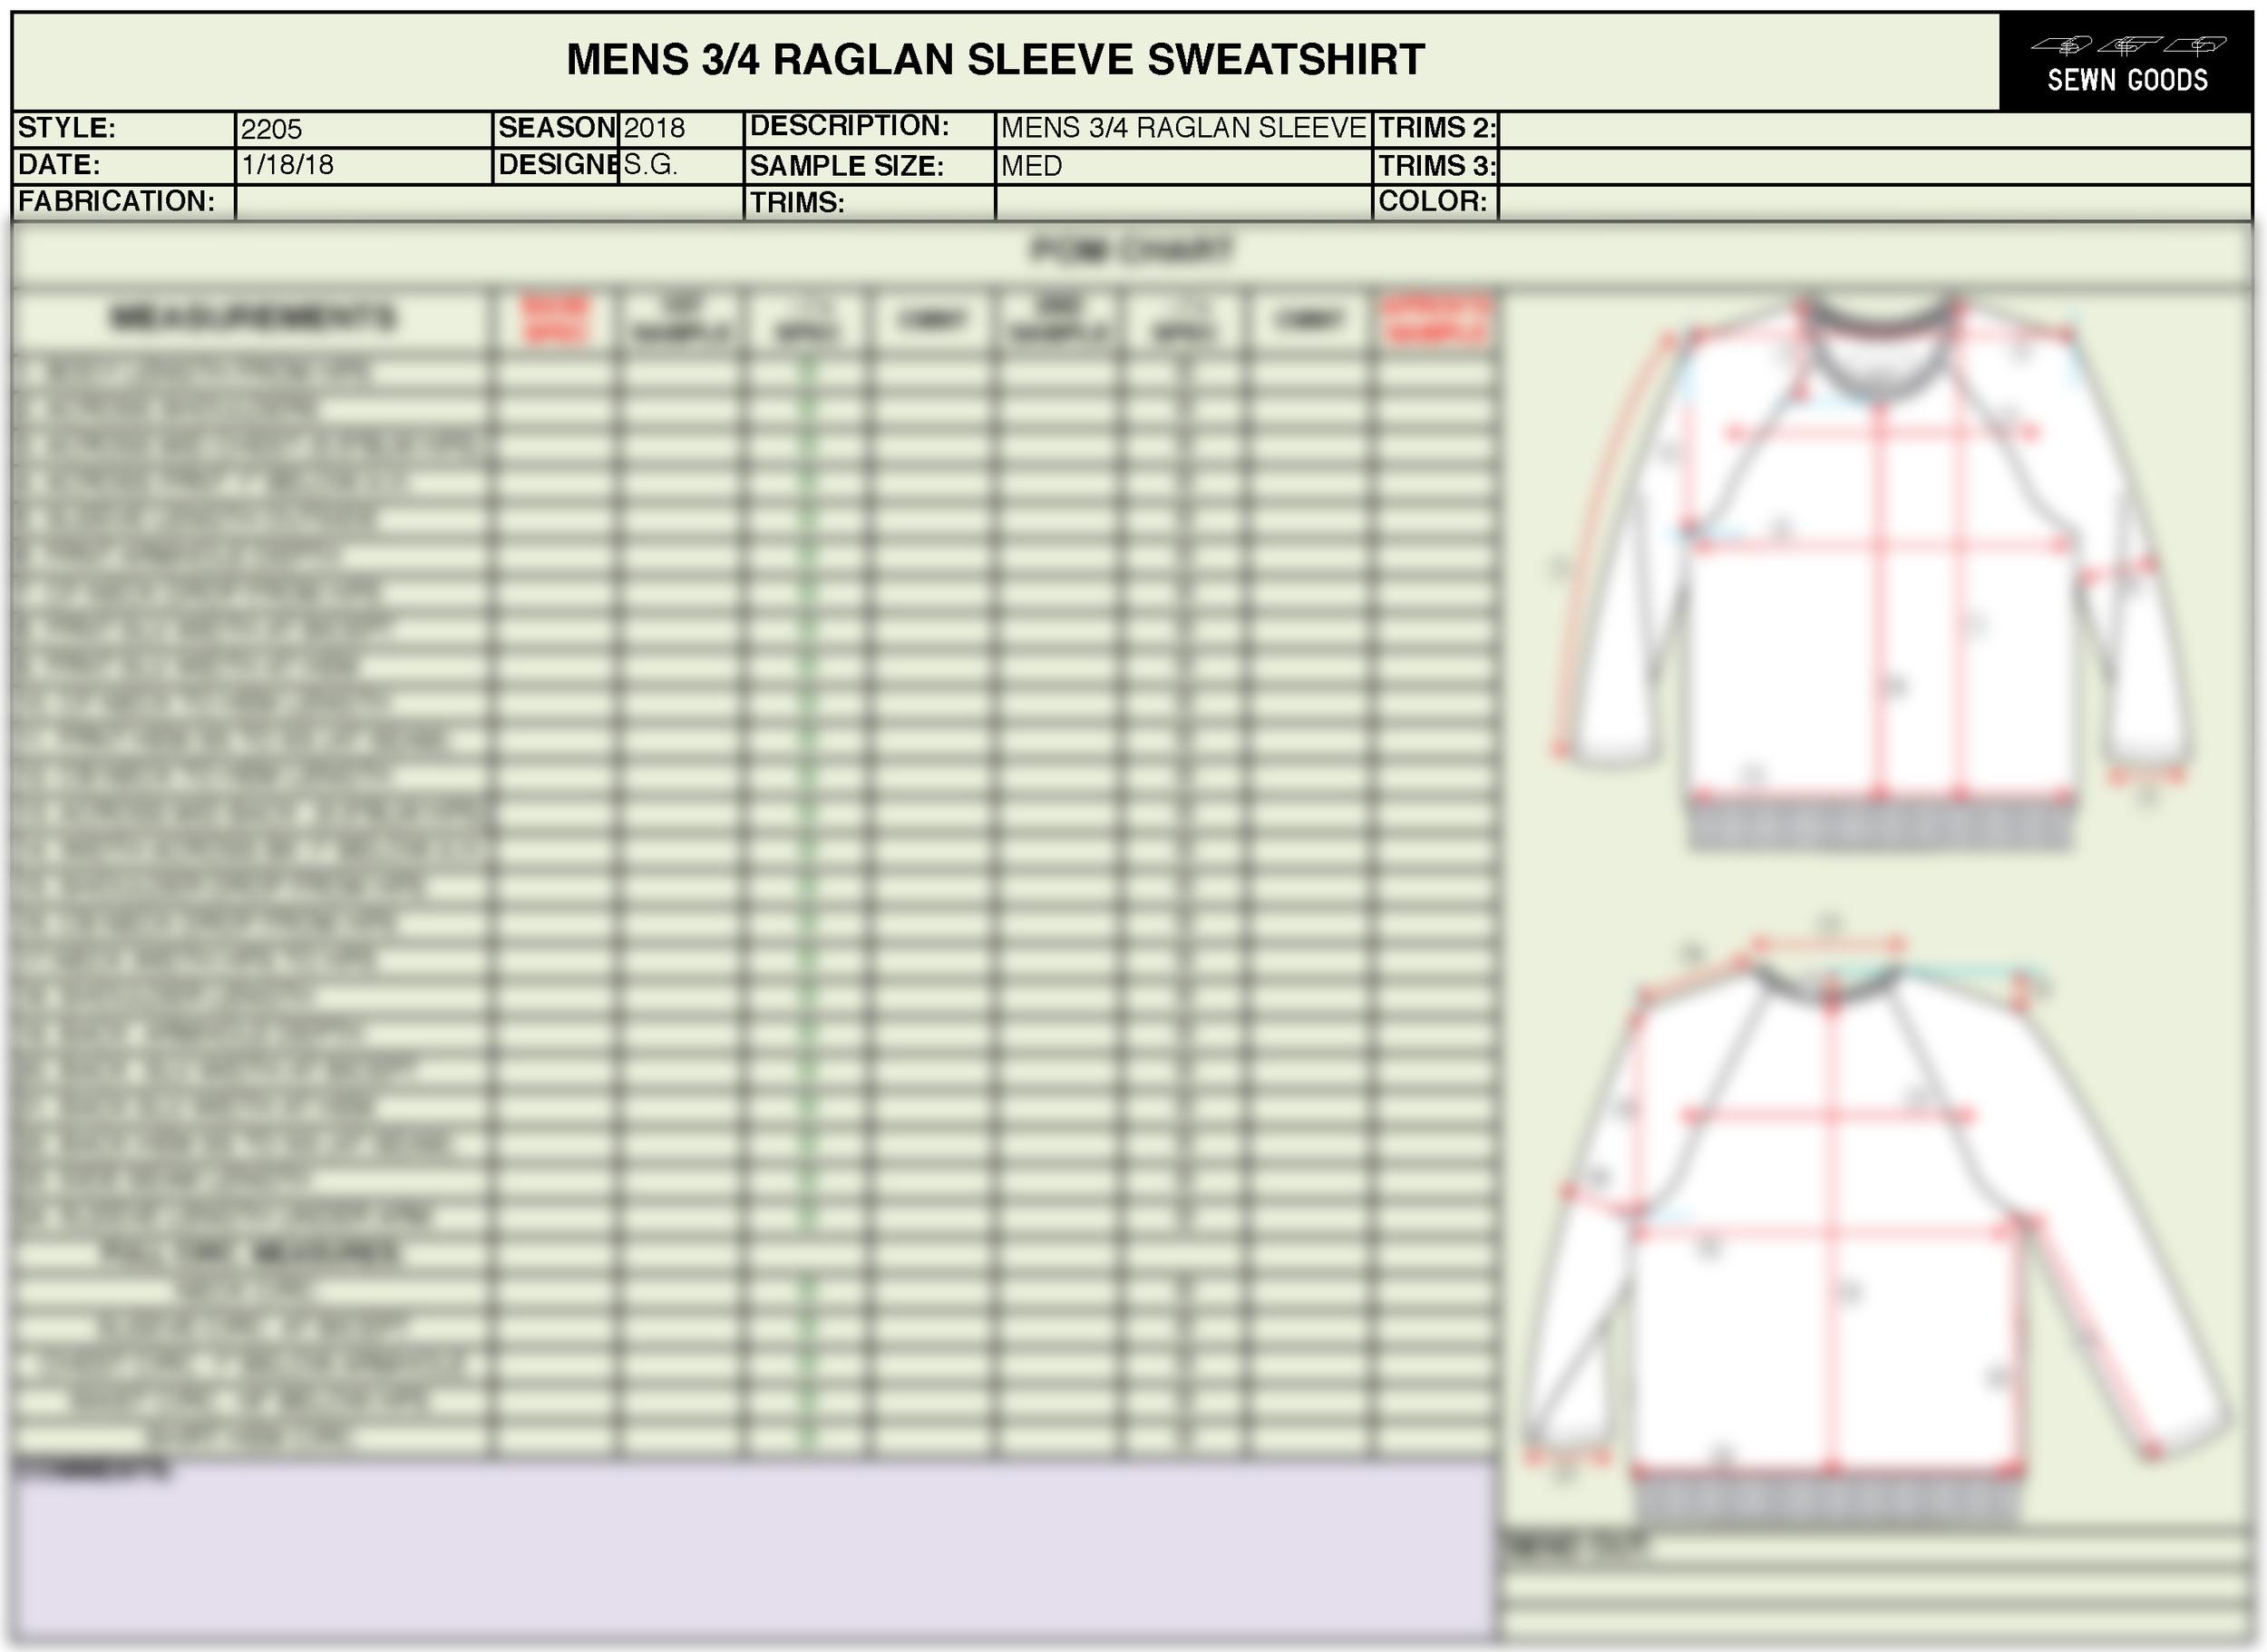 2205 3 4 Raglan Sleeve Sweatshirt Tech Pack Template Xs 4xl Sewn Goods Pattern Makers Sample Makers Apparel Design And Development